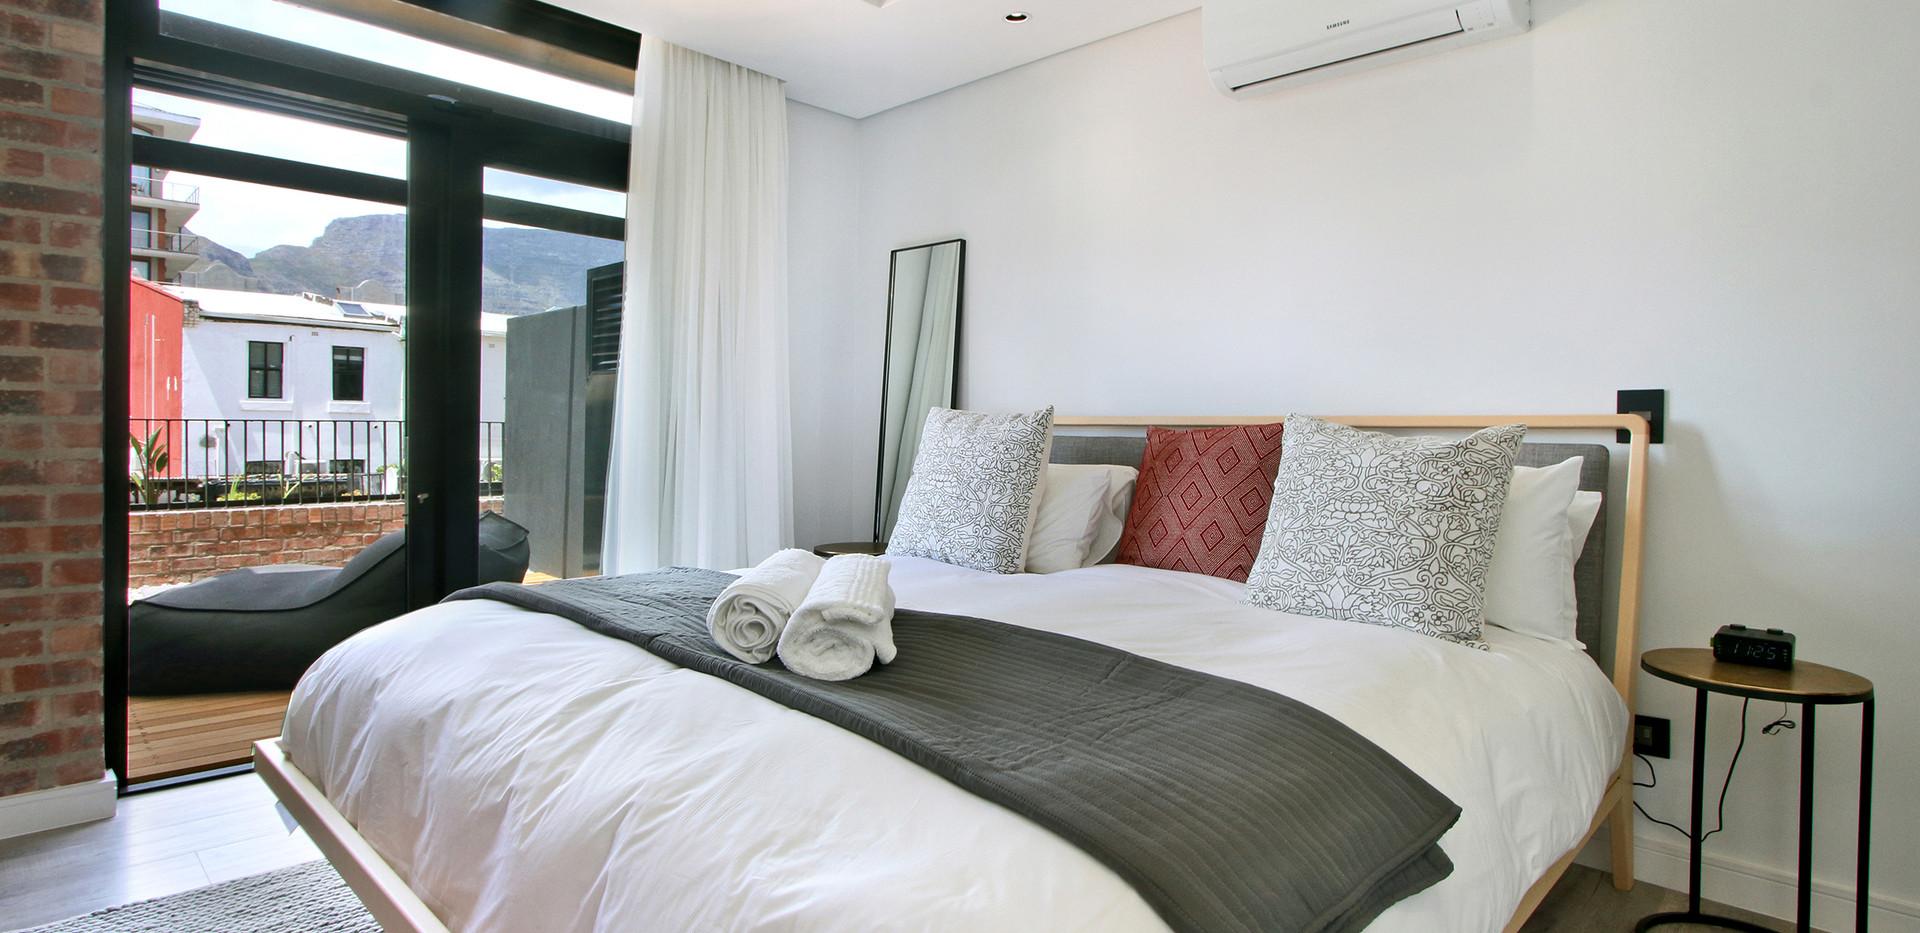 Bedroom_2bedroom_Signatura_206_ITC_1.jpg